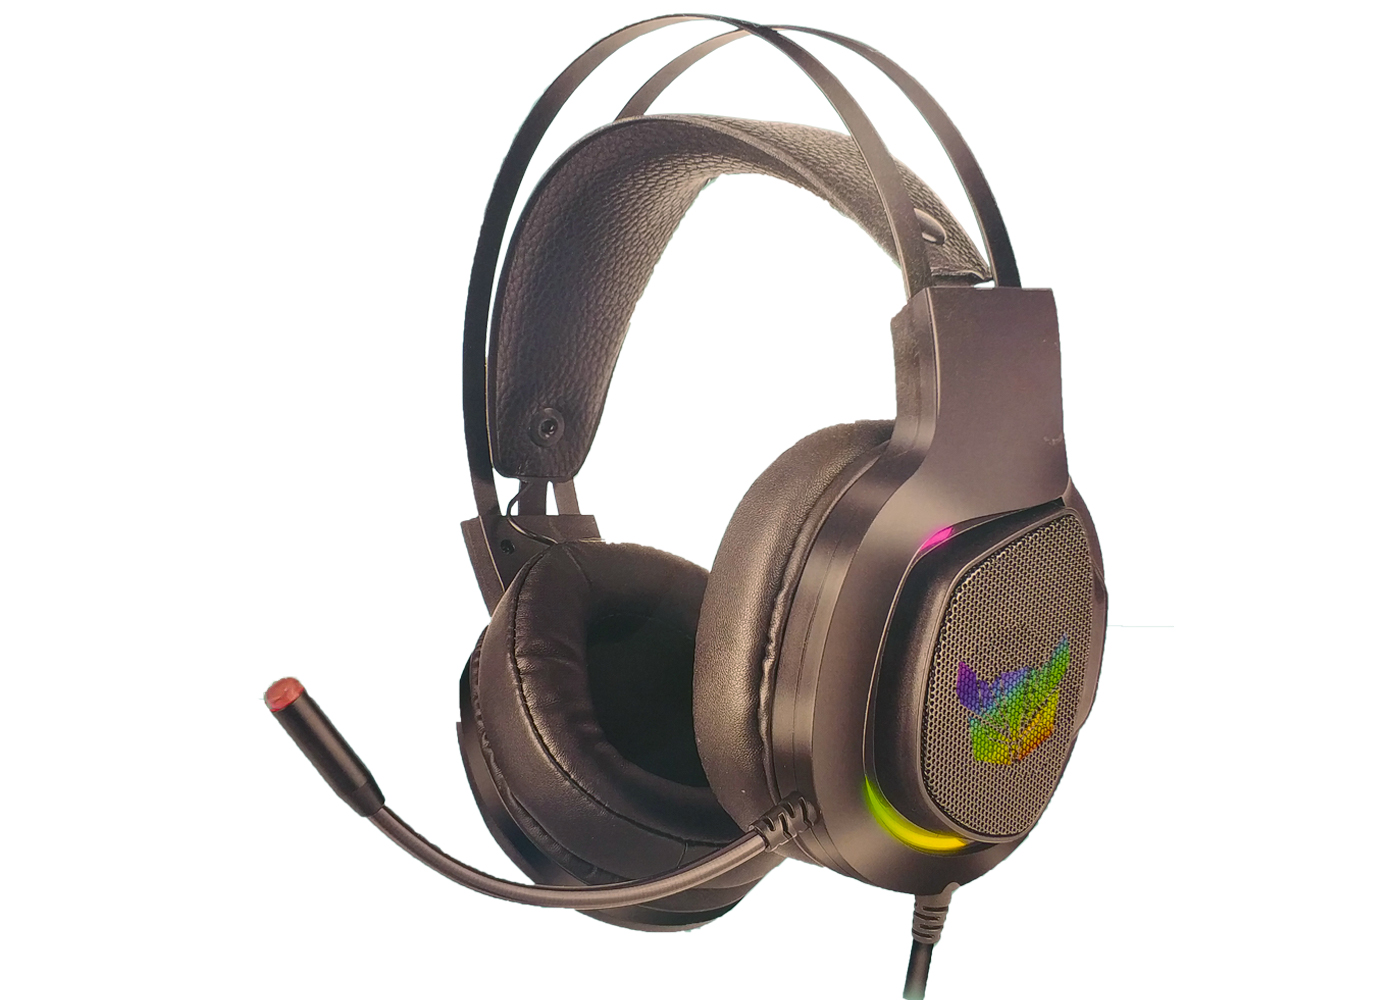 Rowl TYTO RGH-01 Siyah USB 7.1 Surround RGB Gaming Mikrofonlu Oyuncu Kulaklığı